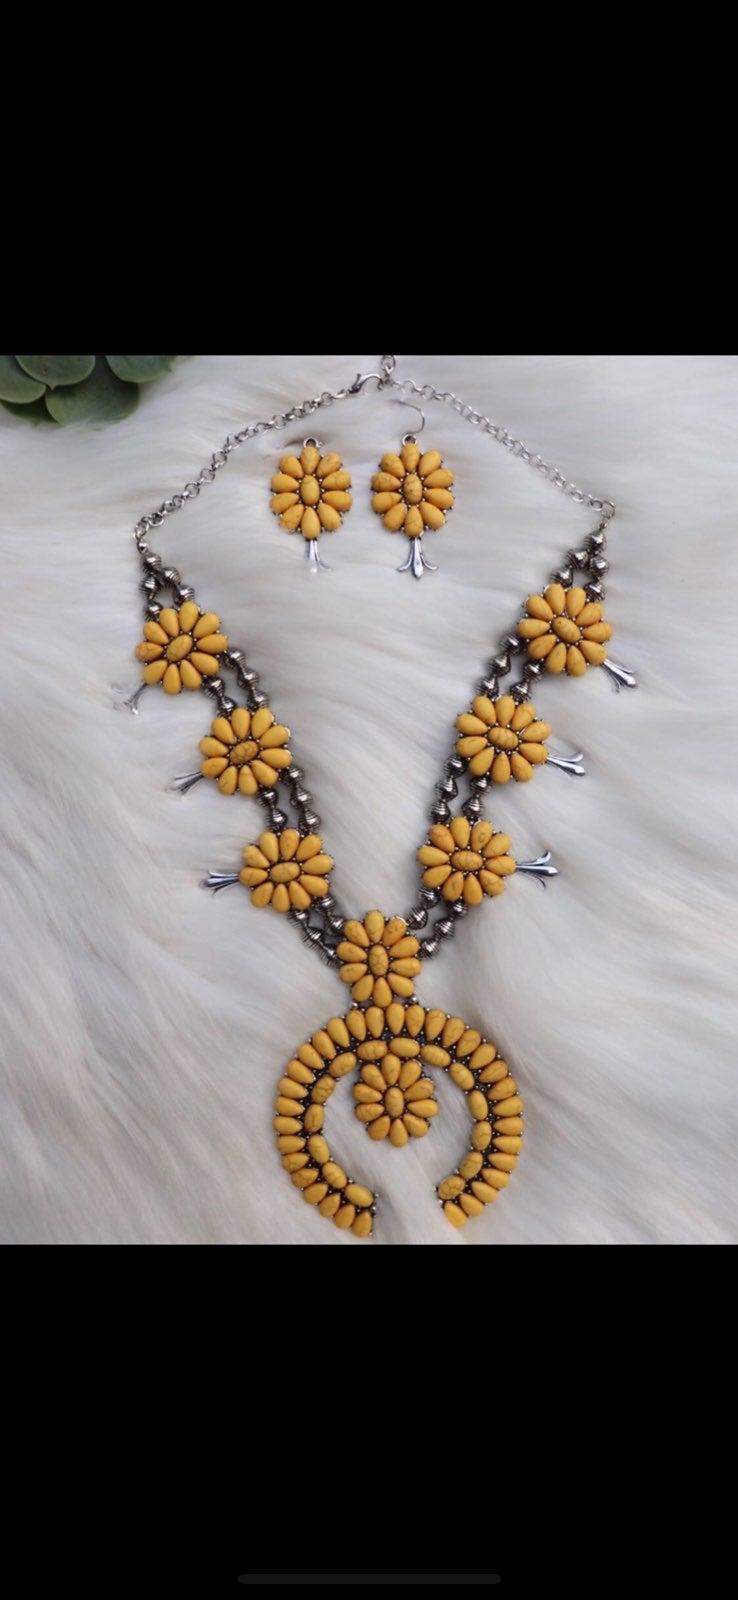 Yellow squash blossom neckalce